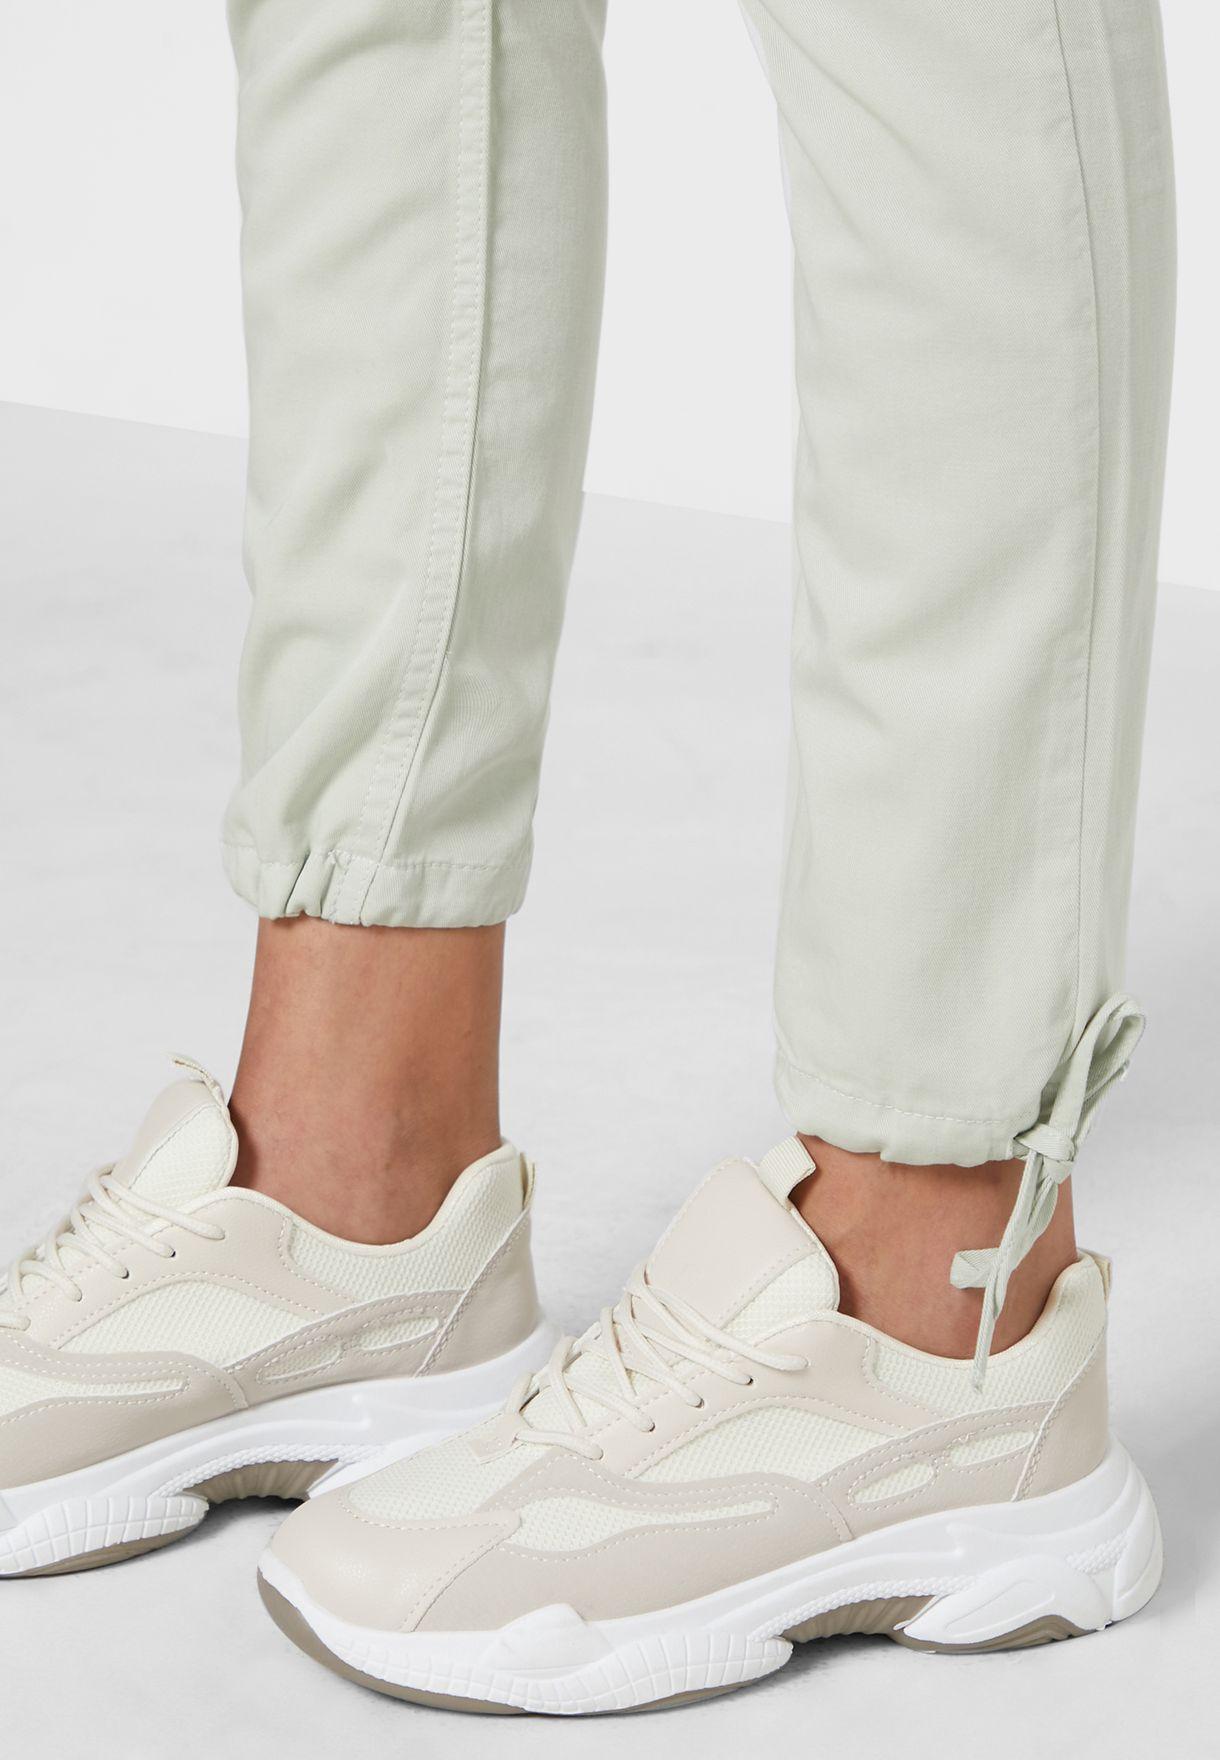 Cuff Tie Detailed Jeans